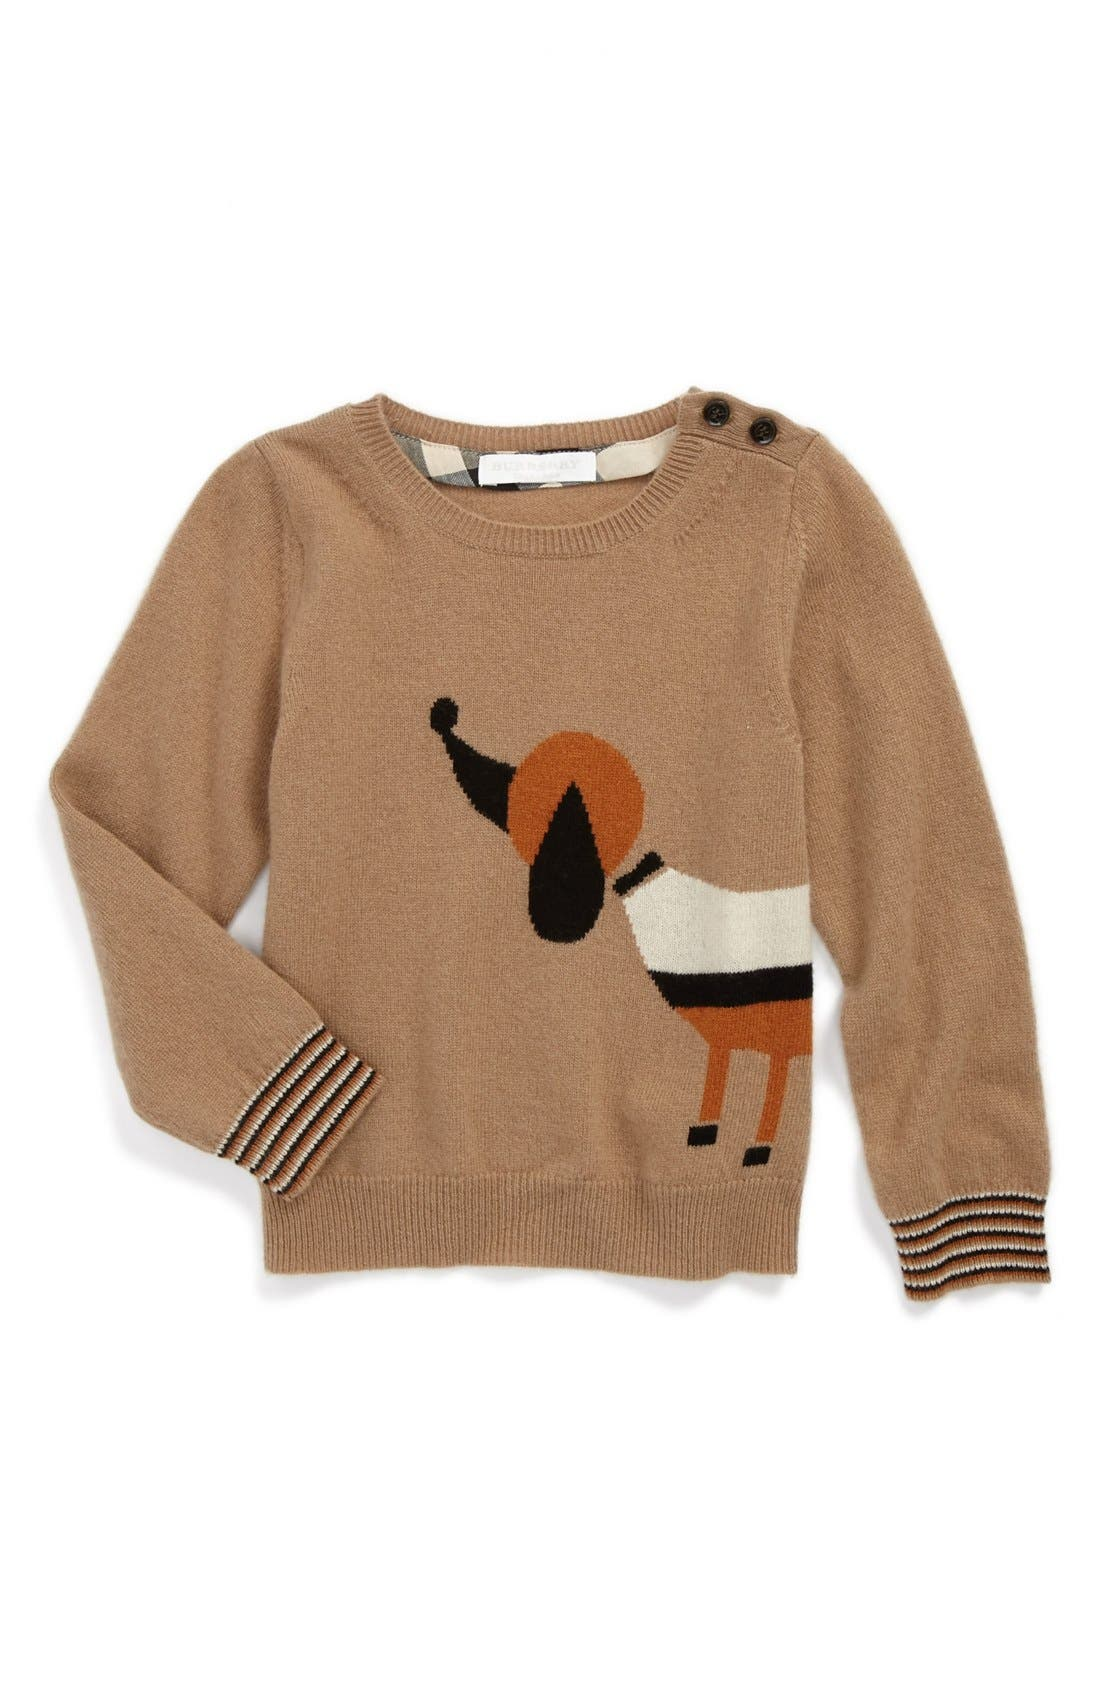 Main Image - Burberry Dog Sweater (Toddler Girls)